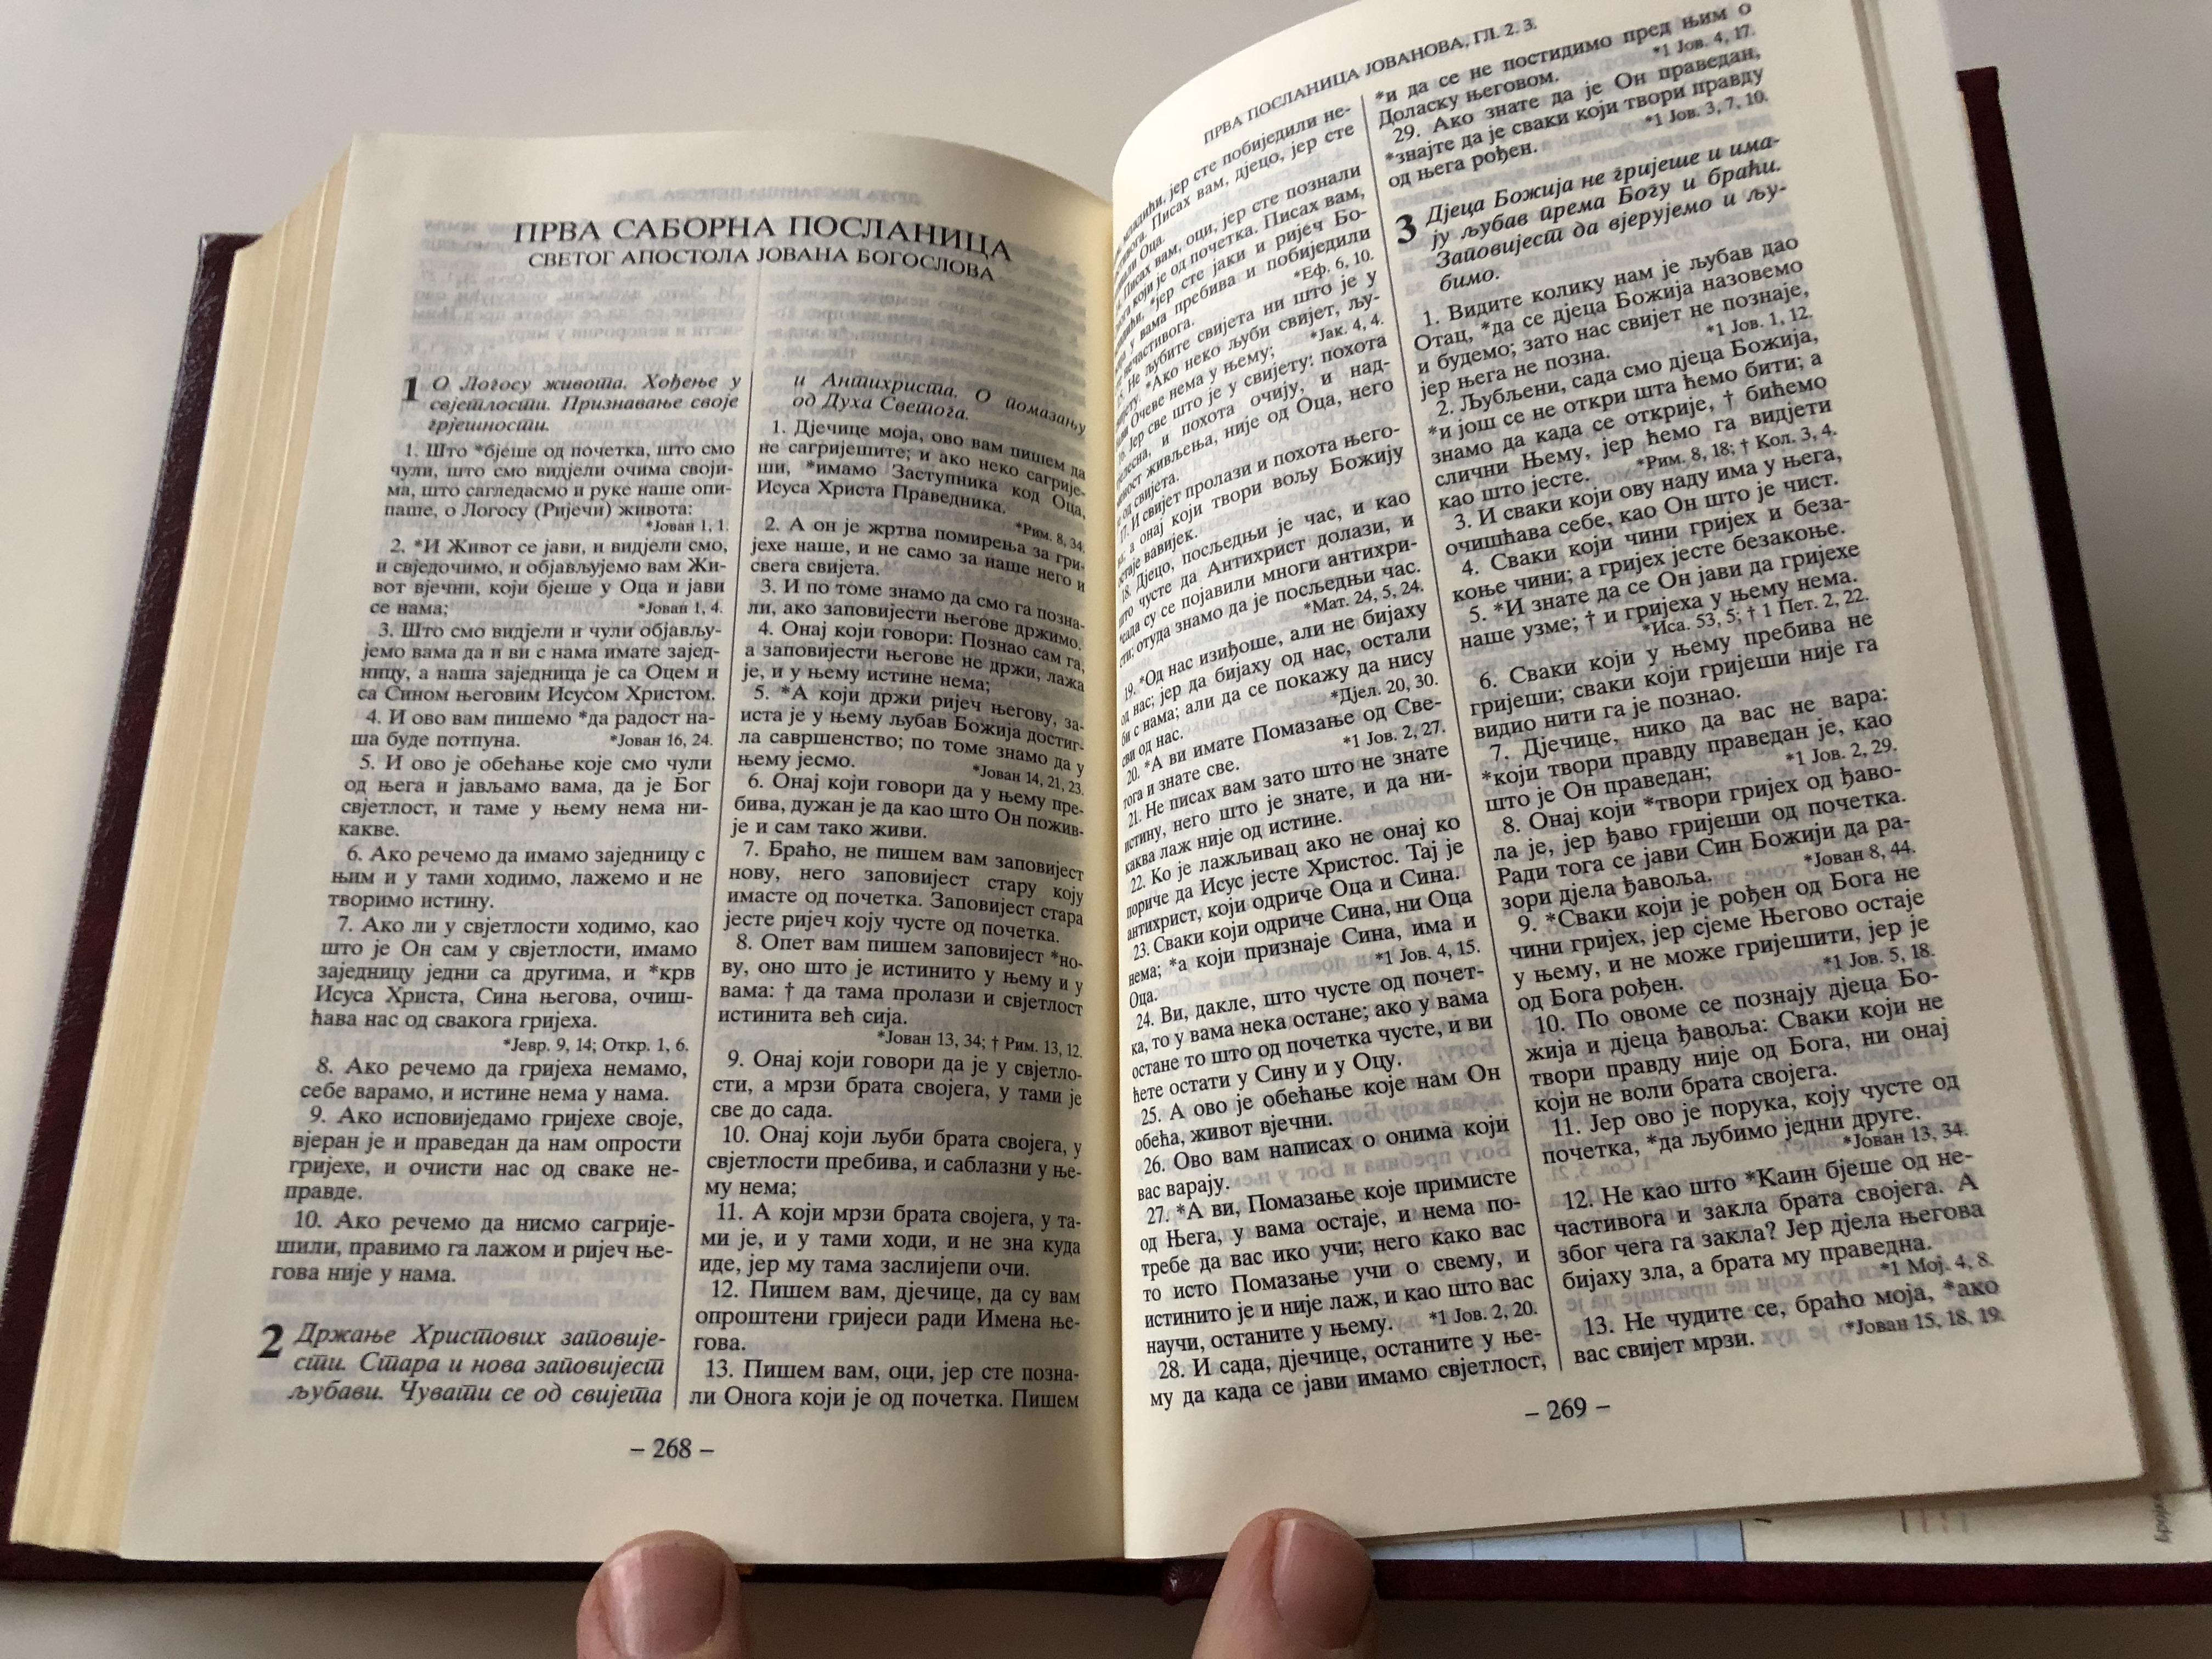 serbian-language-bible-burgundy-cover-with-golden-cross-cyrillic-script-043hs-19-.jpg